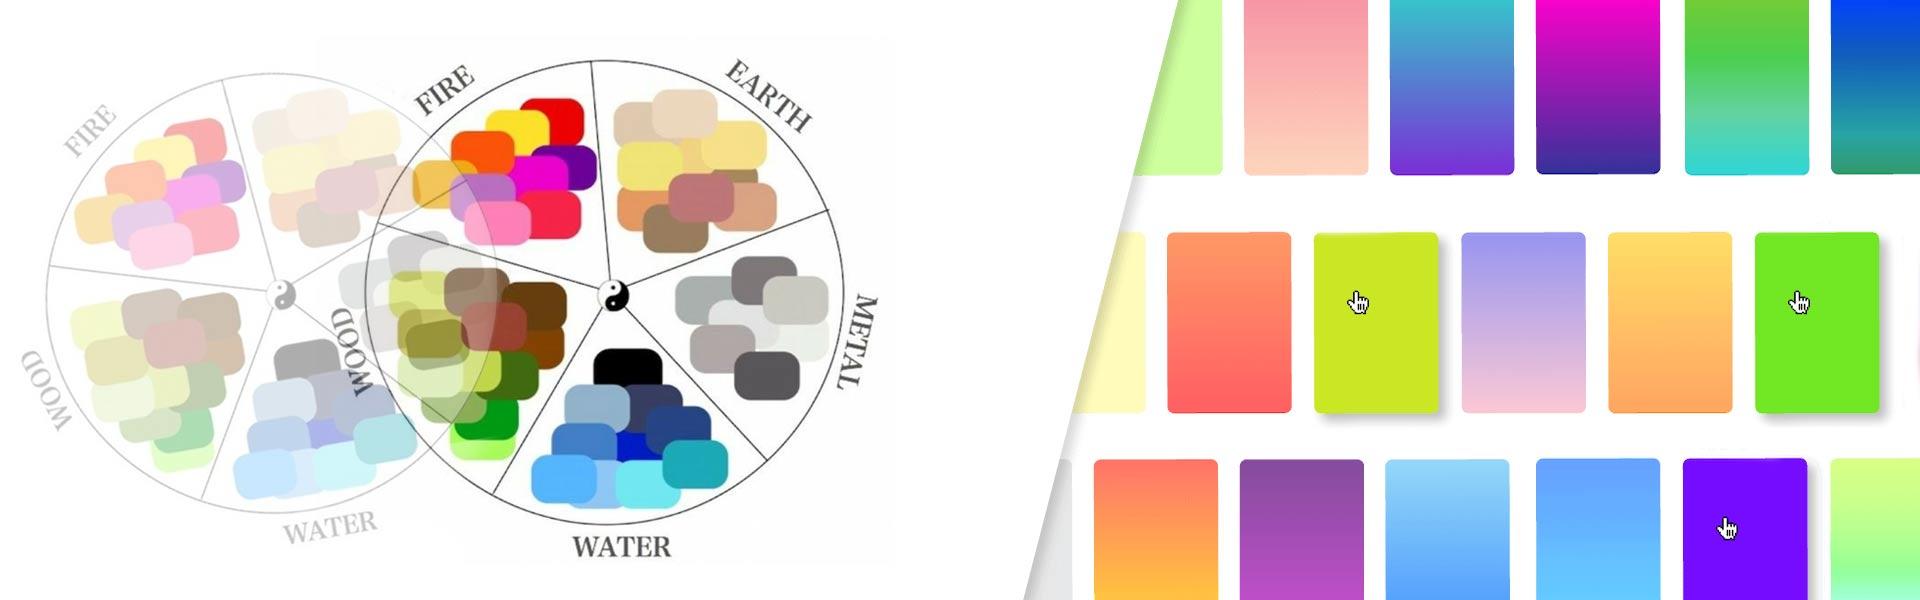 feng shui - فنگ شویی رنگ ها ، رنگ شناسی فنگ شویی